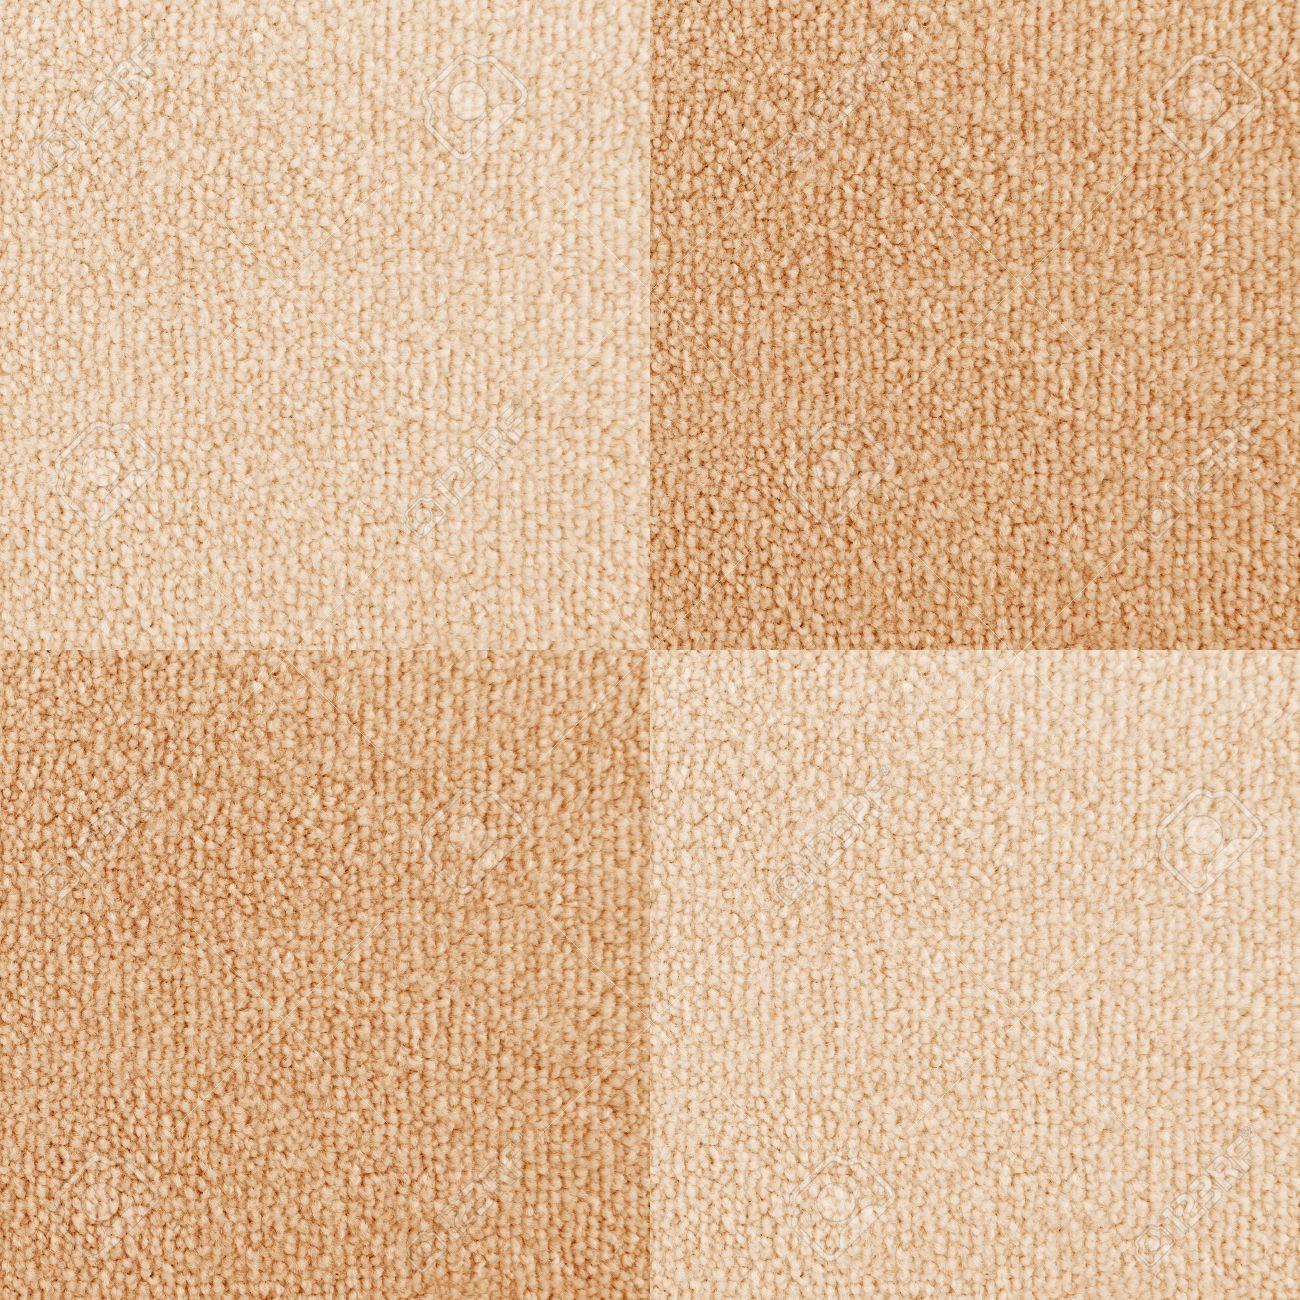 New Checkered Carpet Texture Bright Beige Carpet Flooring As Stock